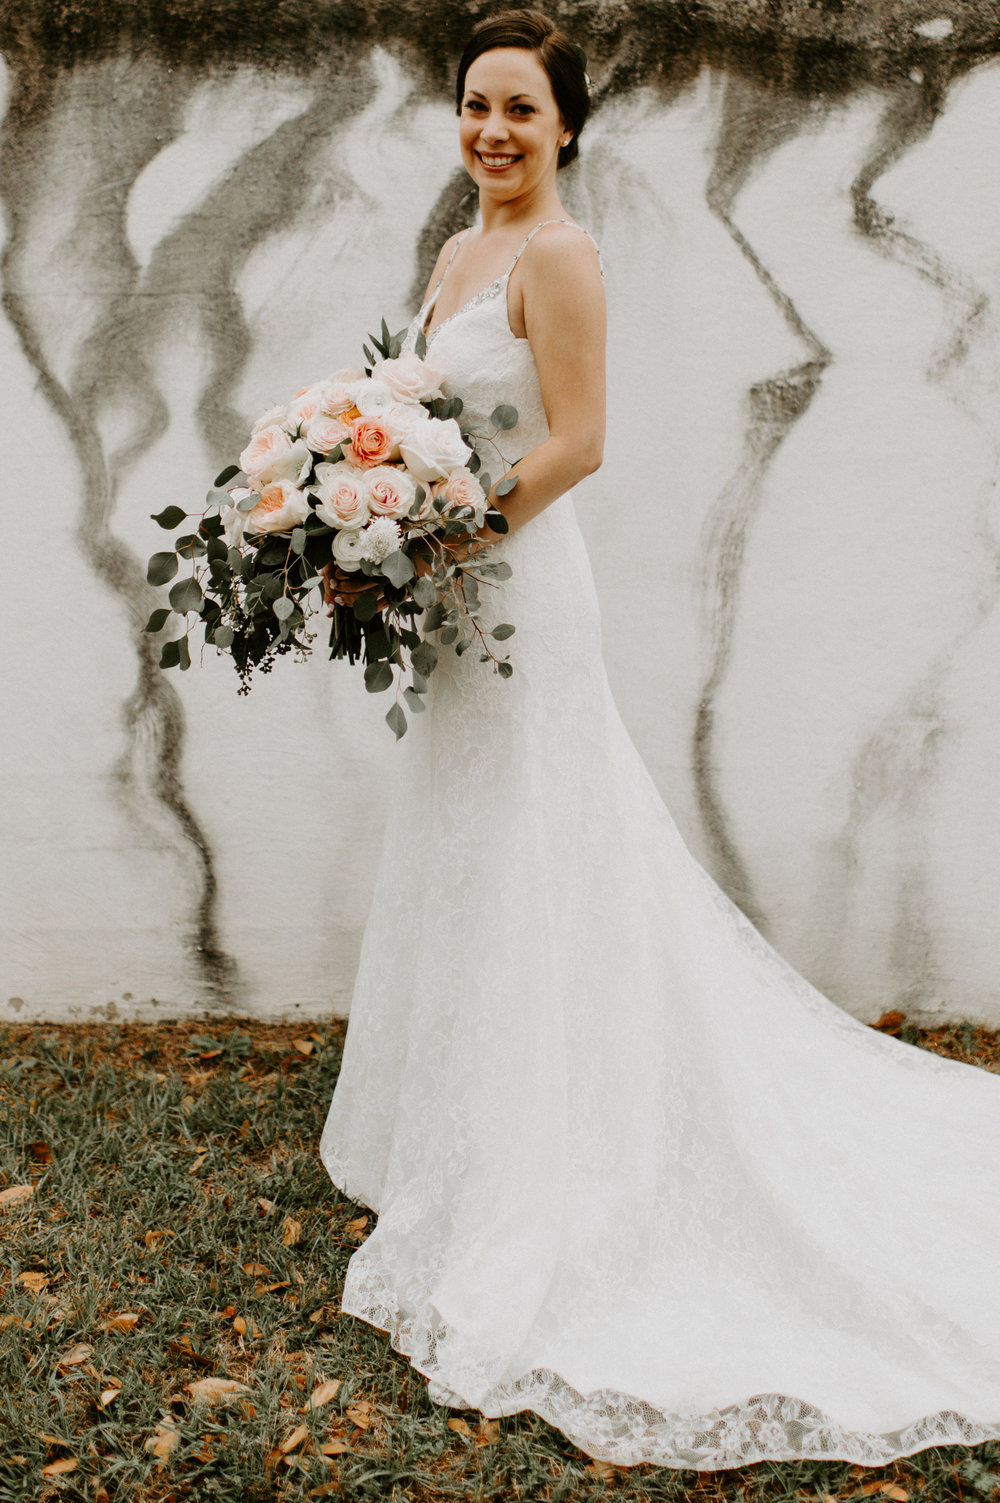 savannah-bridal-shop-andrea-and-mike-evergold-photography-georgia-state-railroad-museum-wedding-savannah-wedding-florist-savannah-wedding-planner-39.jpg